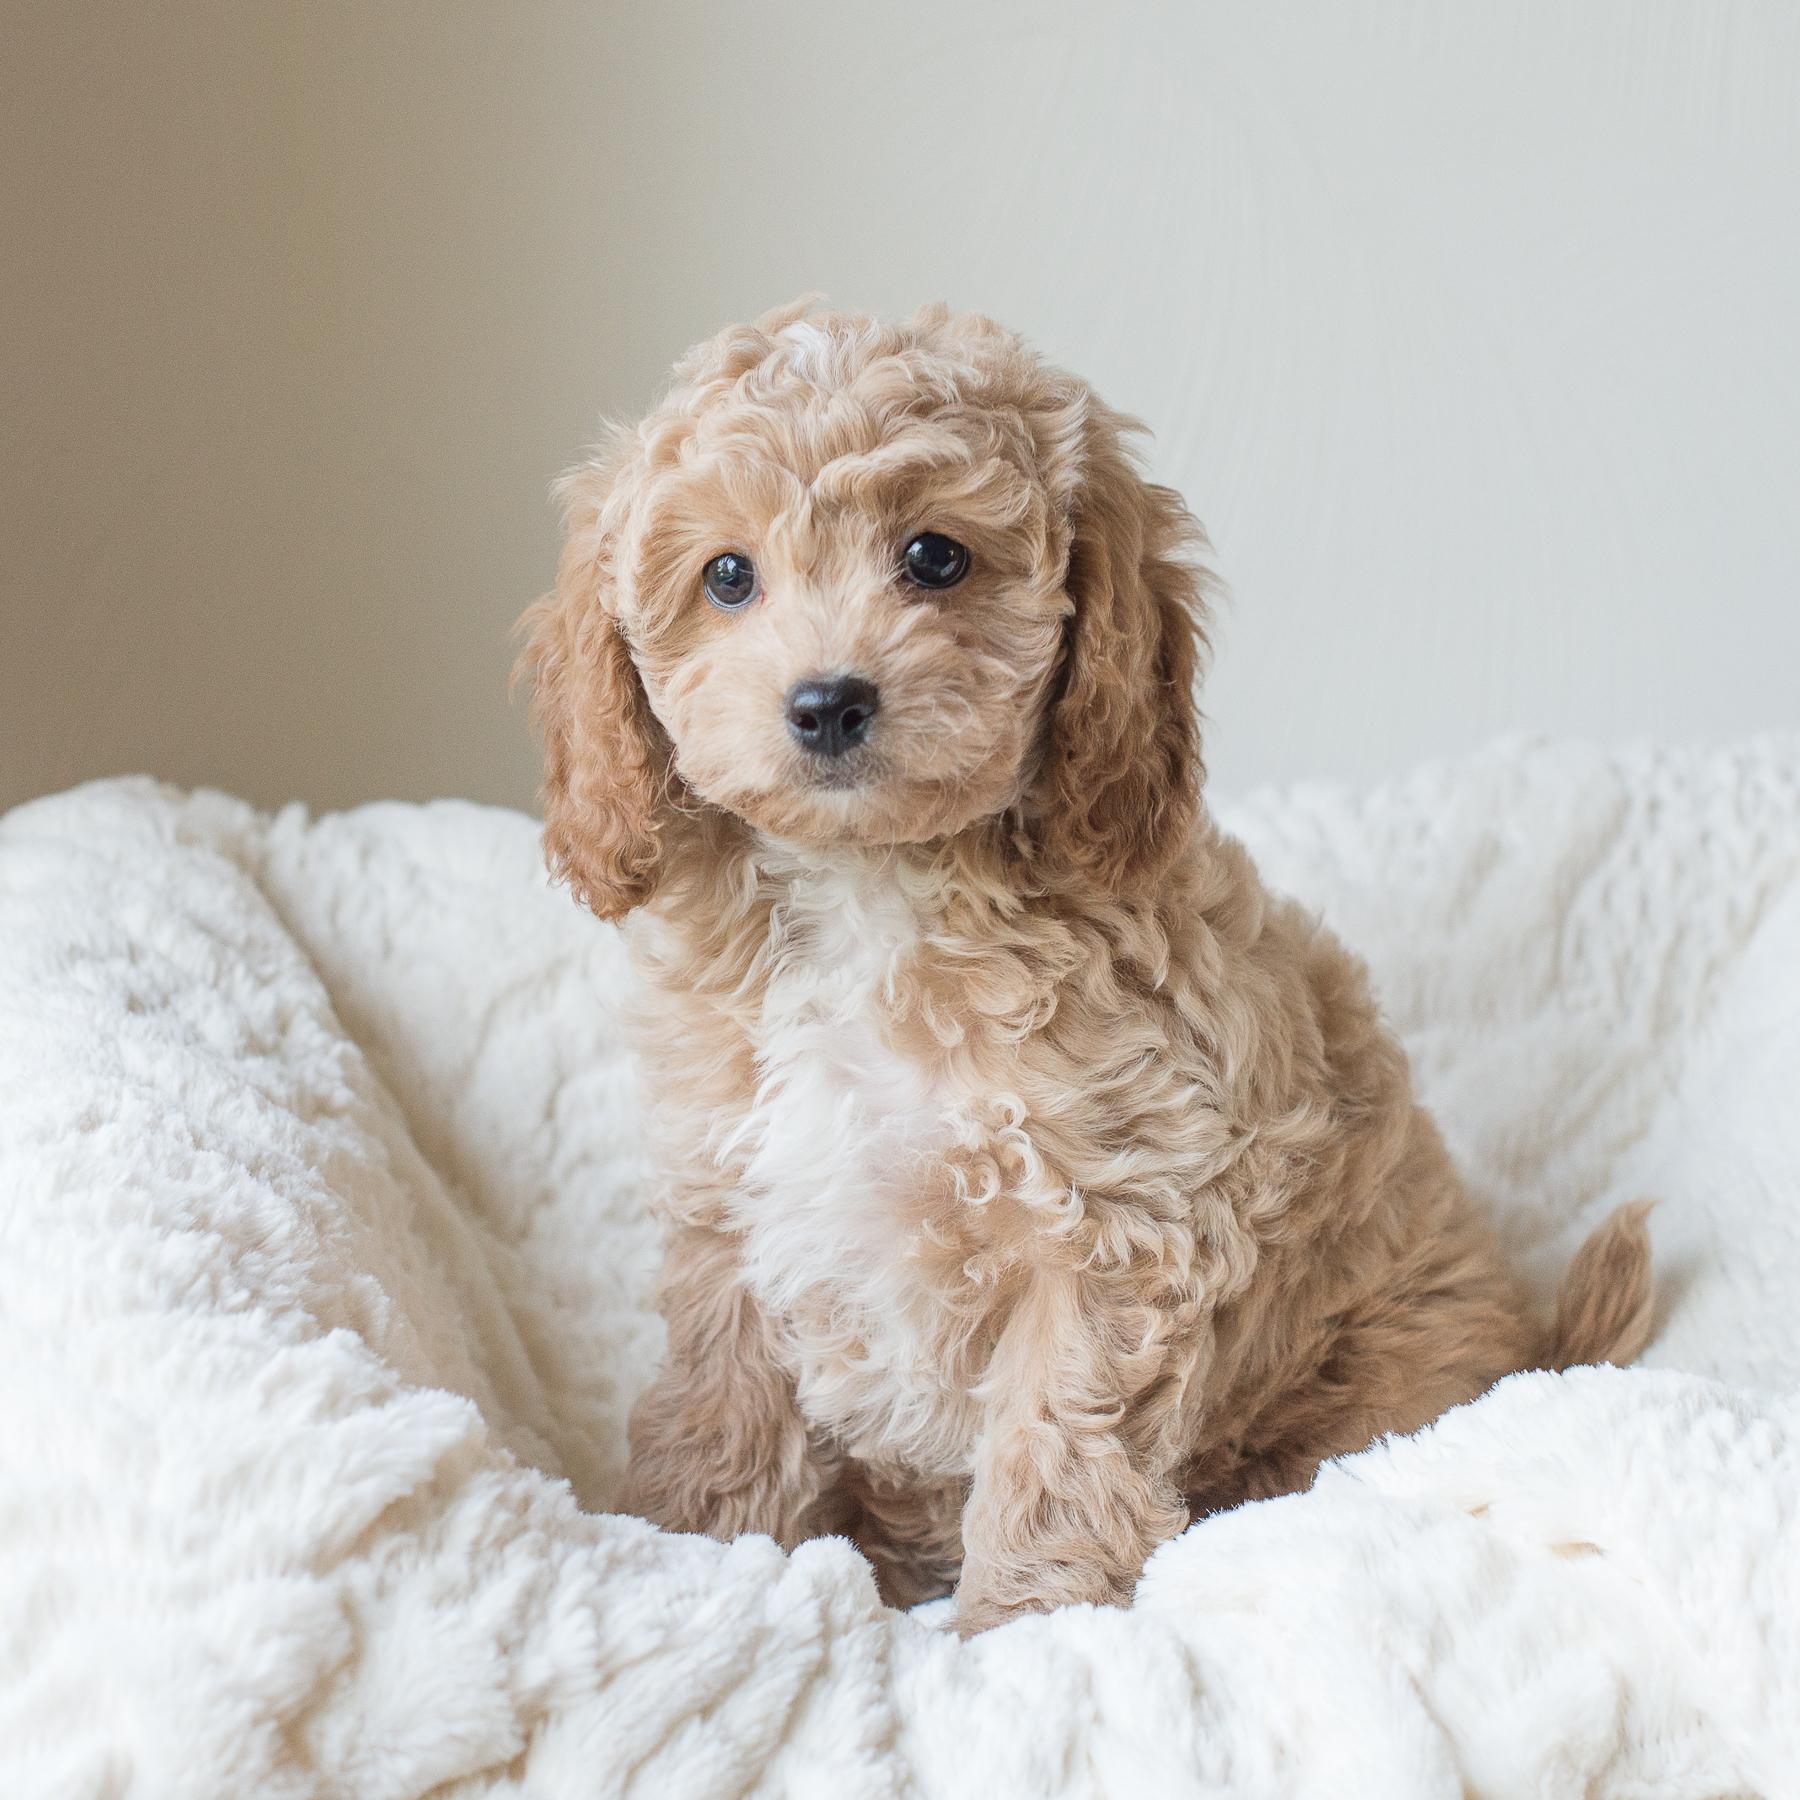 Cooper, Susie - Cavapoochon Puppy.jpg